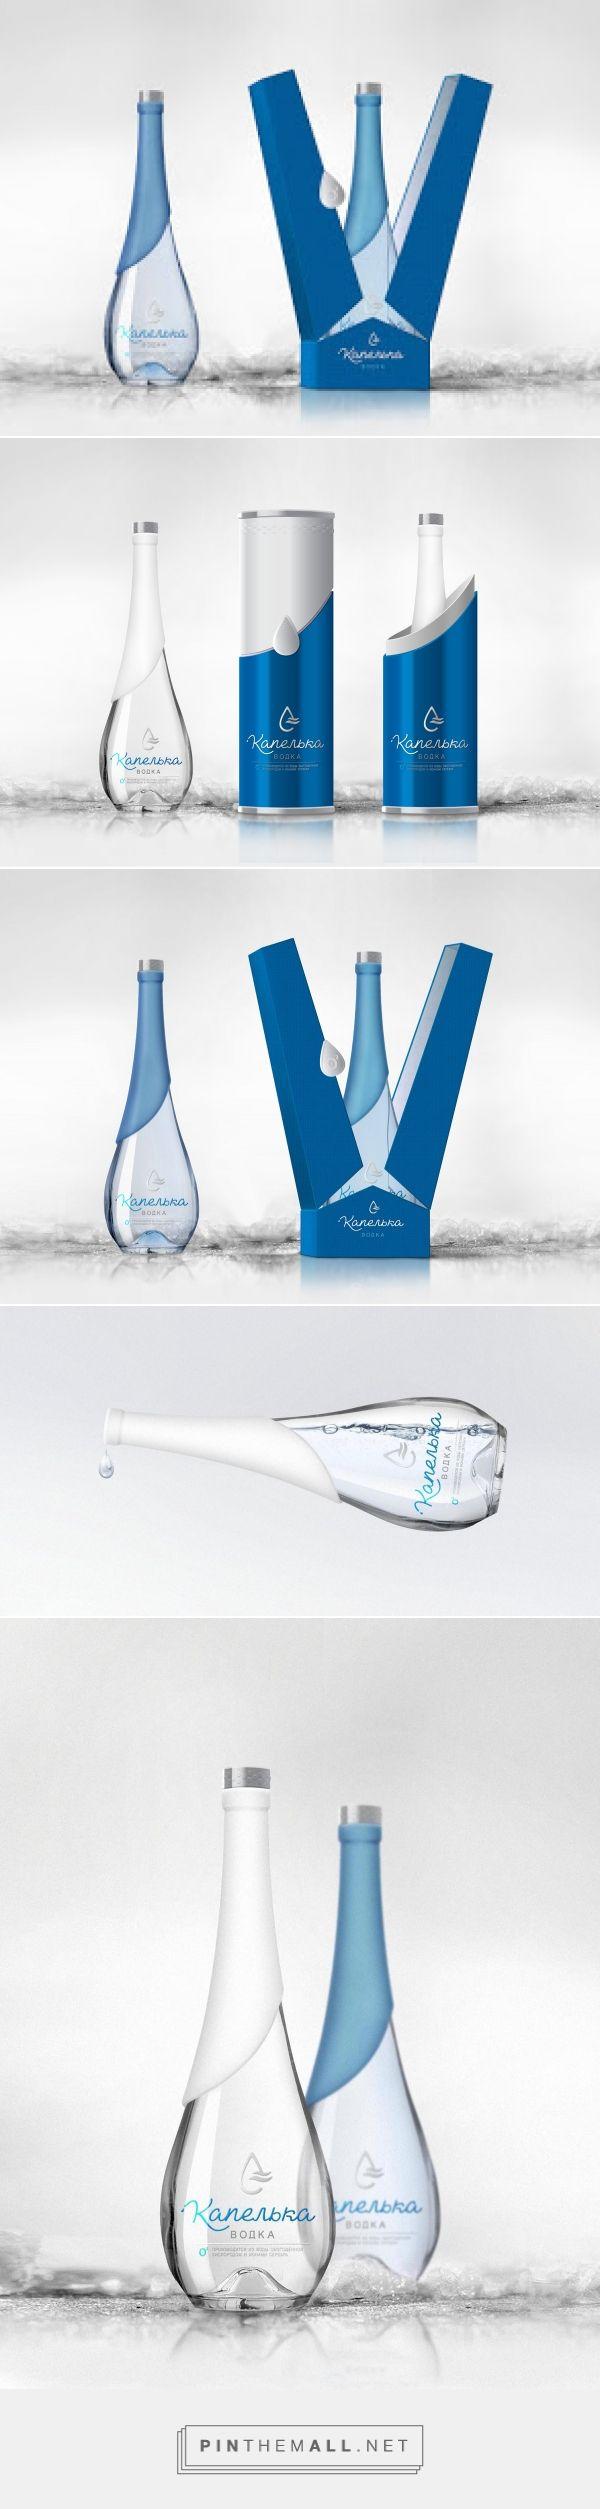 Droplet Vodka packaging design by BrandPa - http://www.packagingoftheworld.com/2017/09/droplet-vodka.html